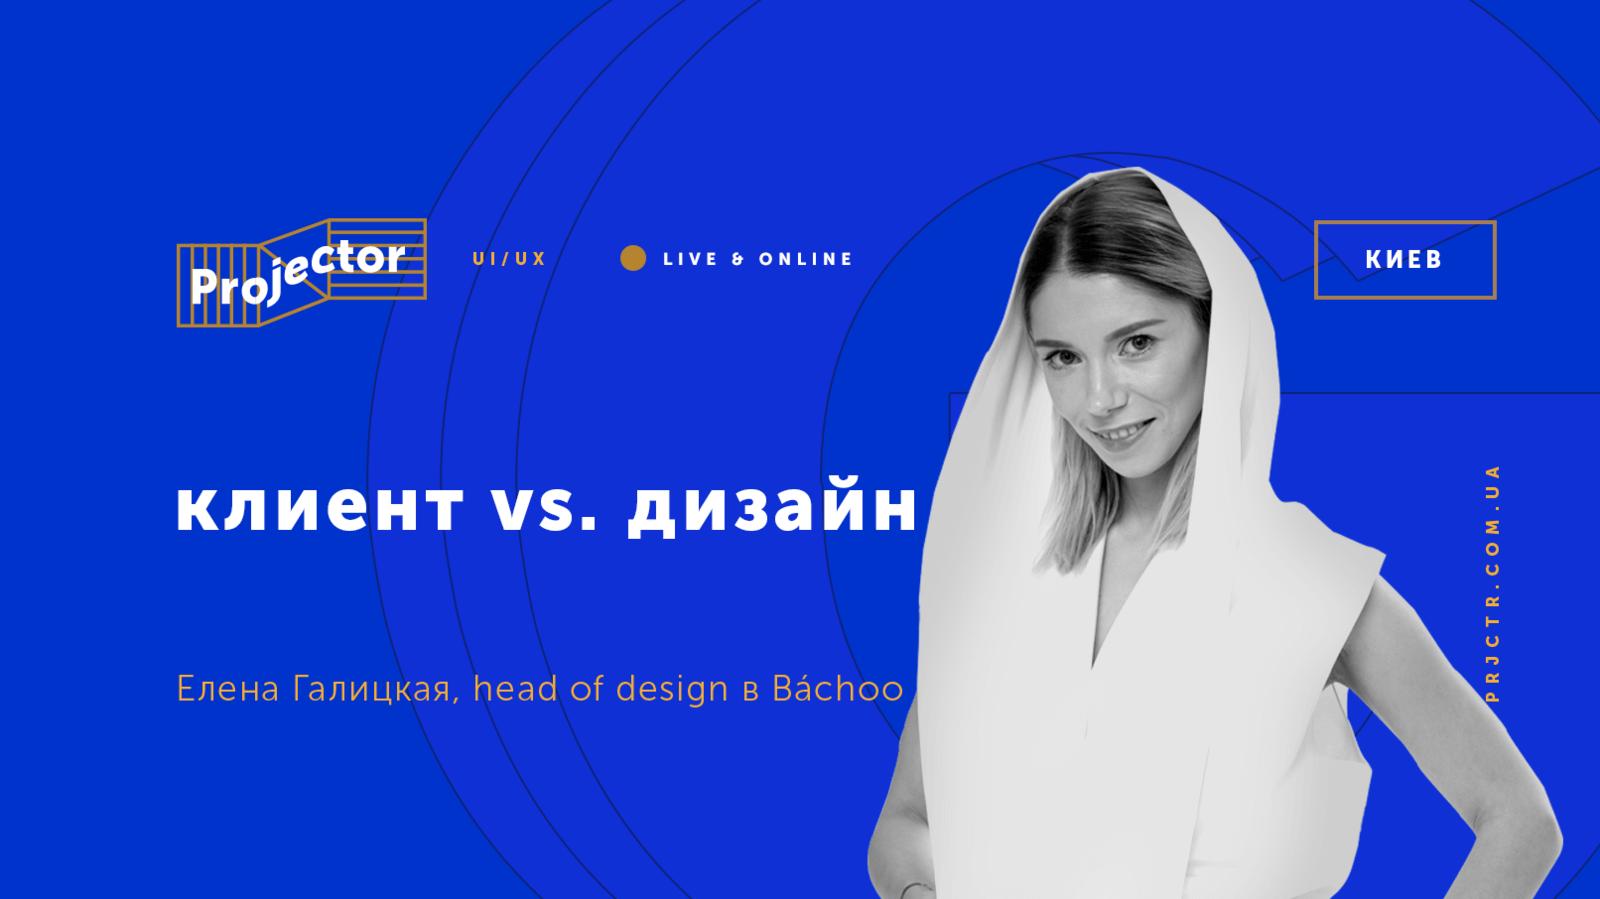 Клиент vs. Дизайн